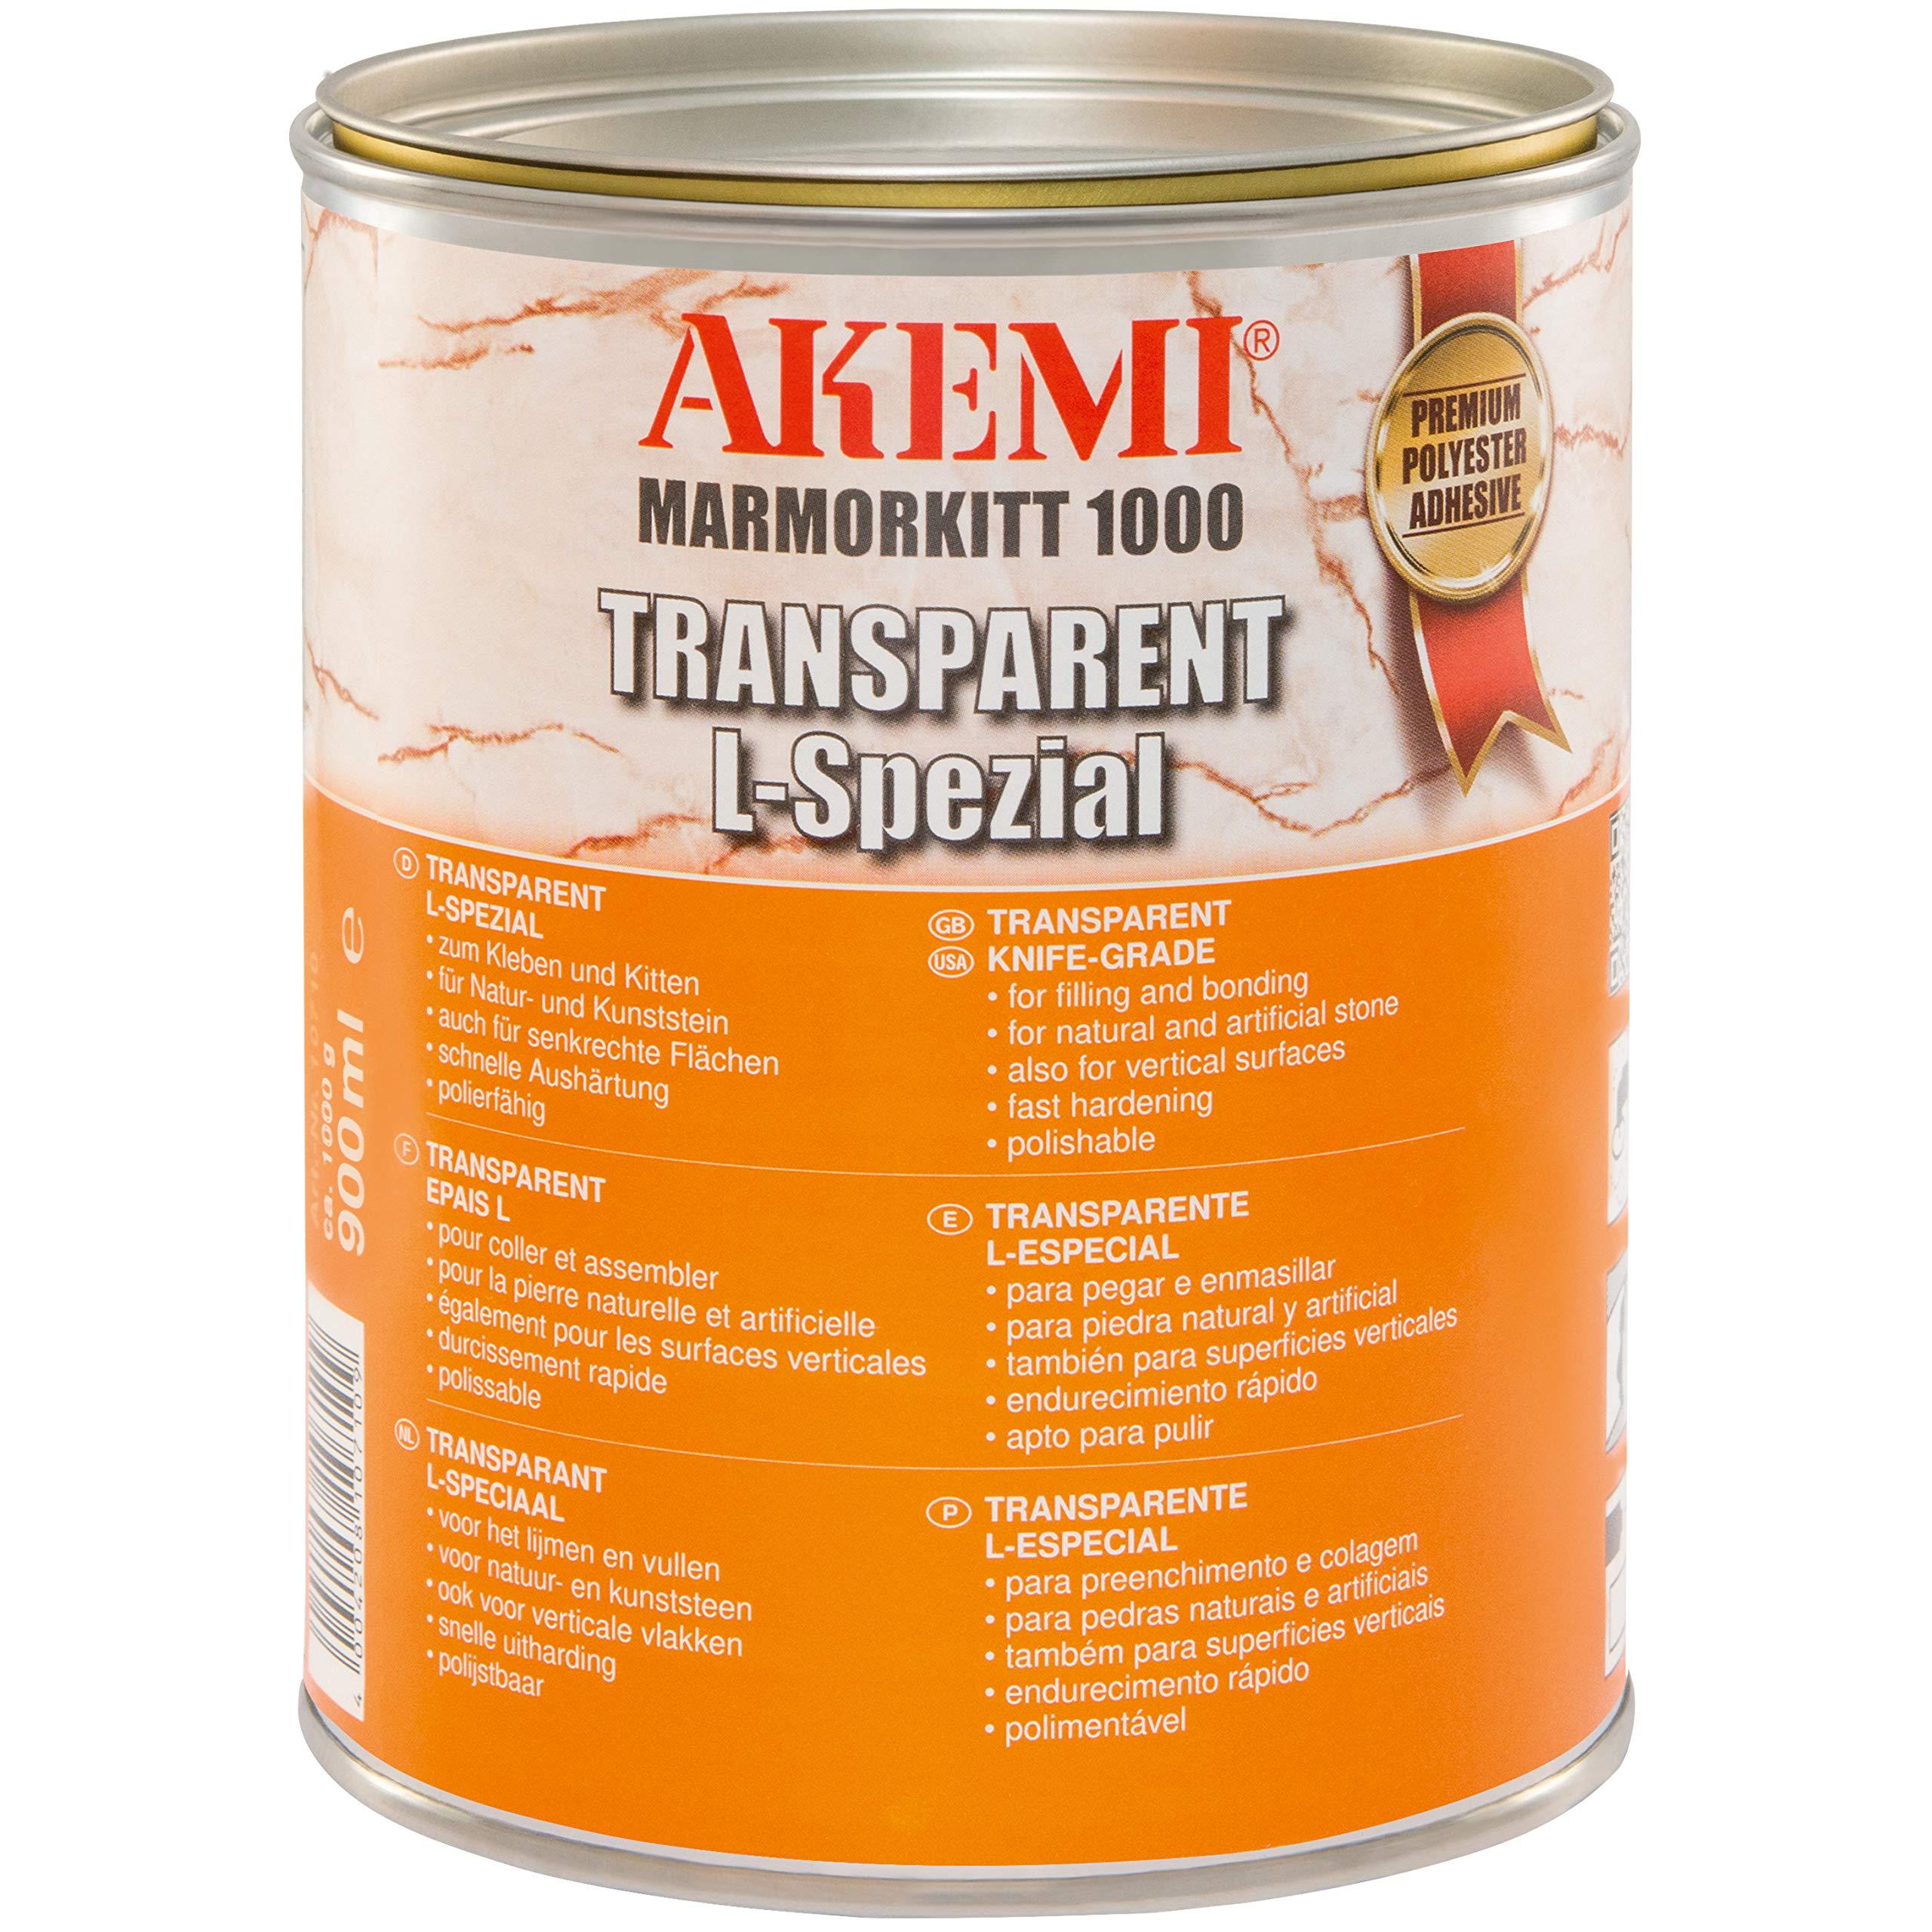 Akemi Marmorkitt 1000 Transparent Knifegrade Epoxy by Transparent L-Spezial